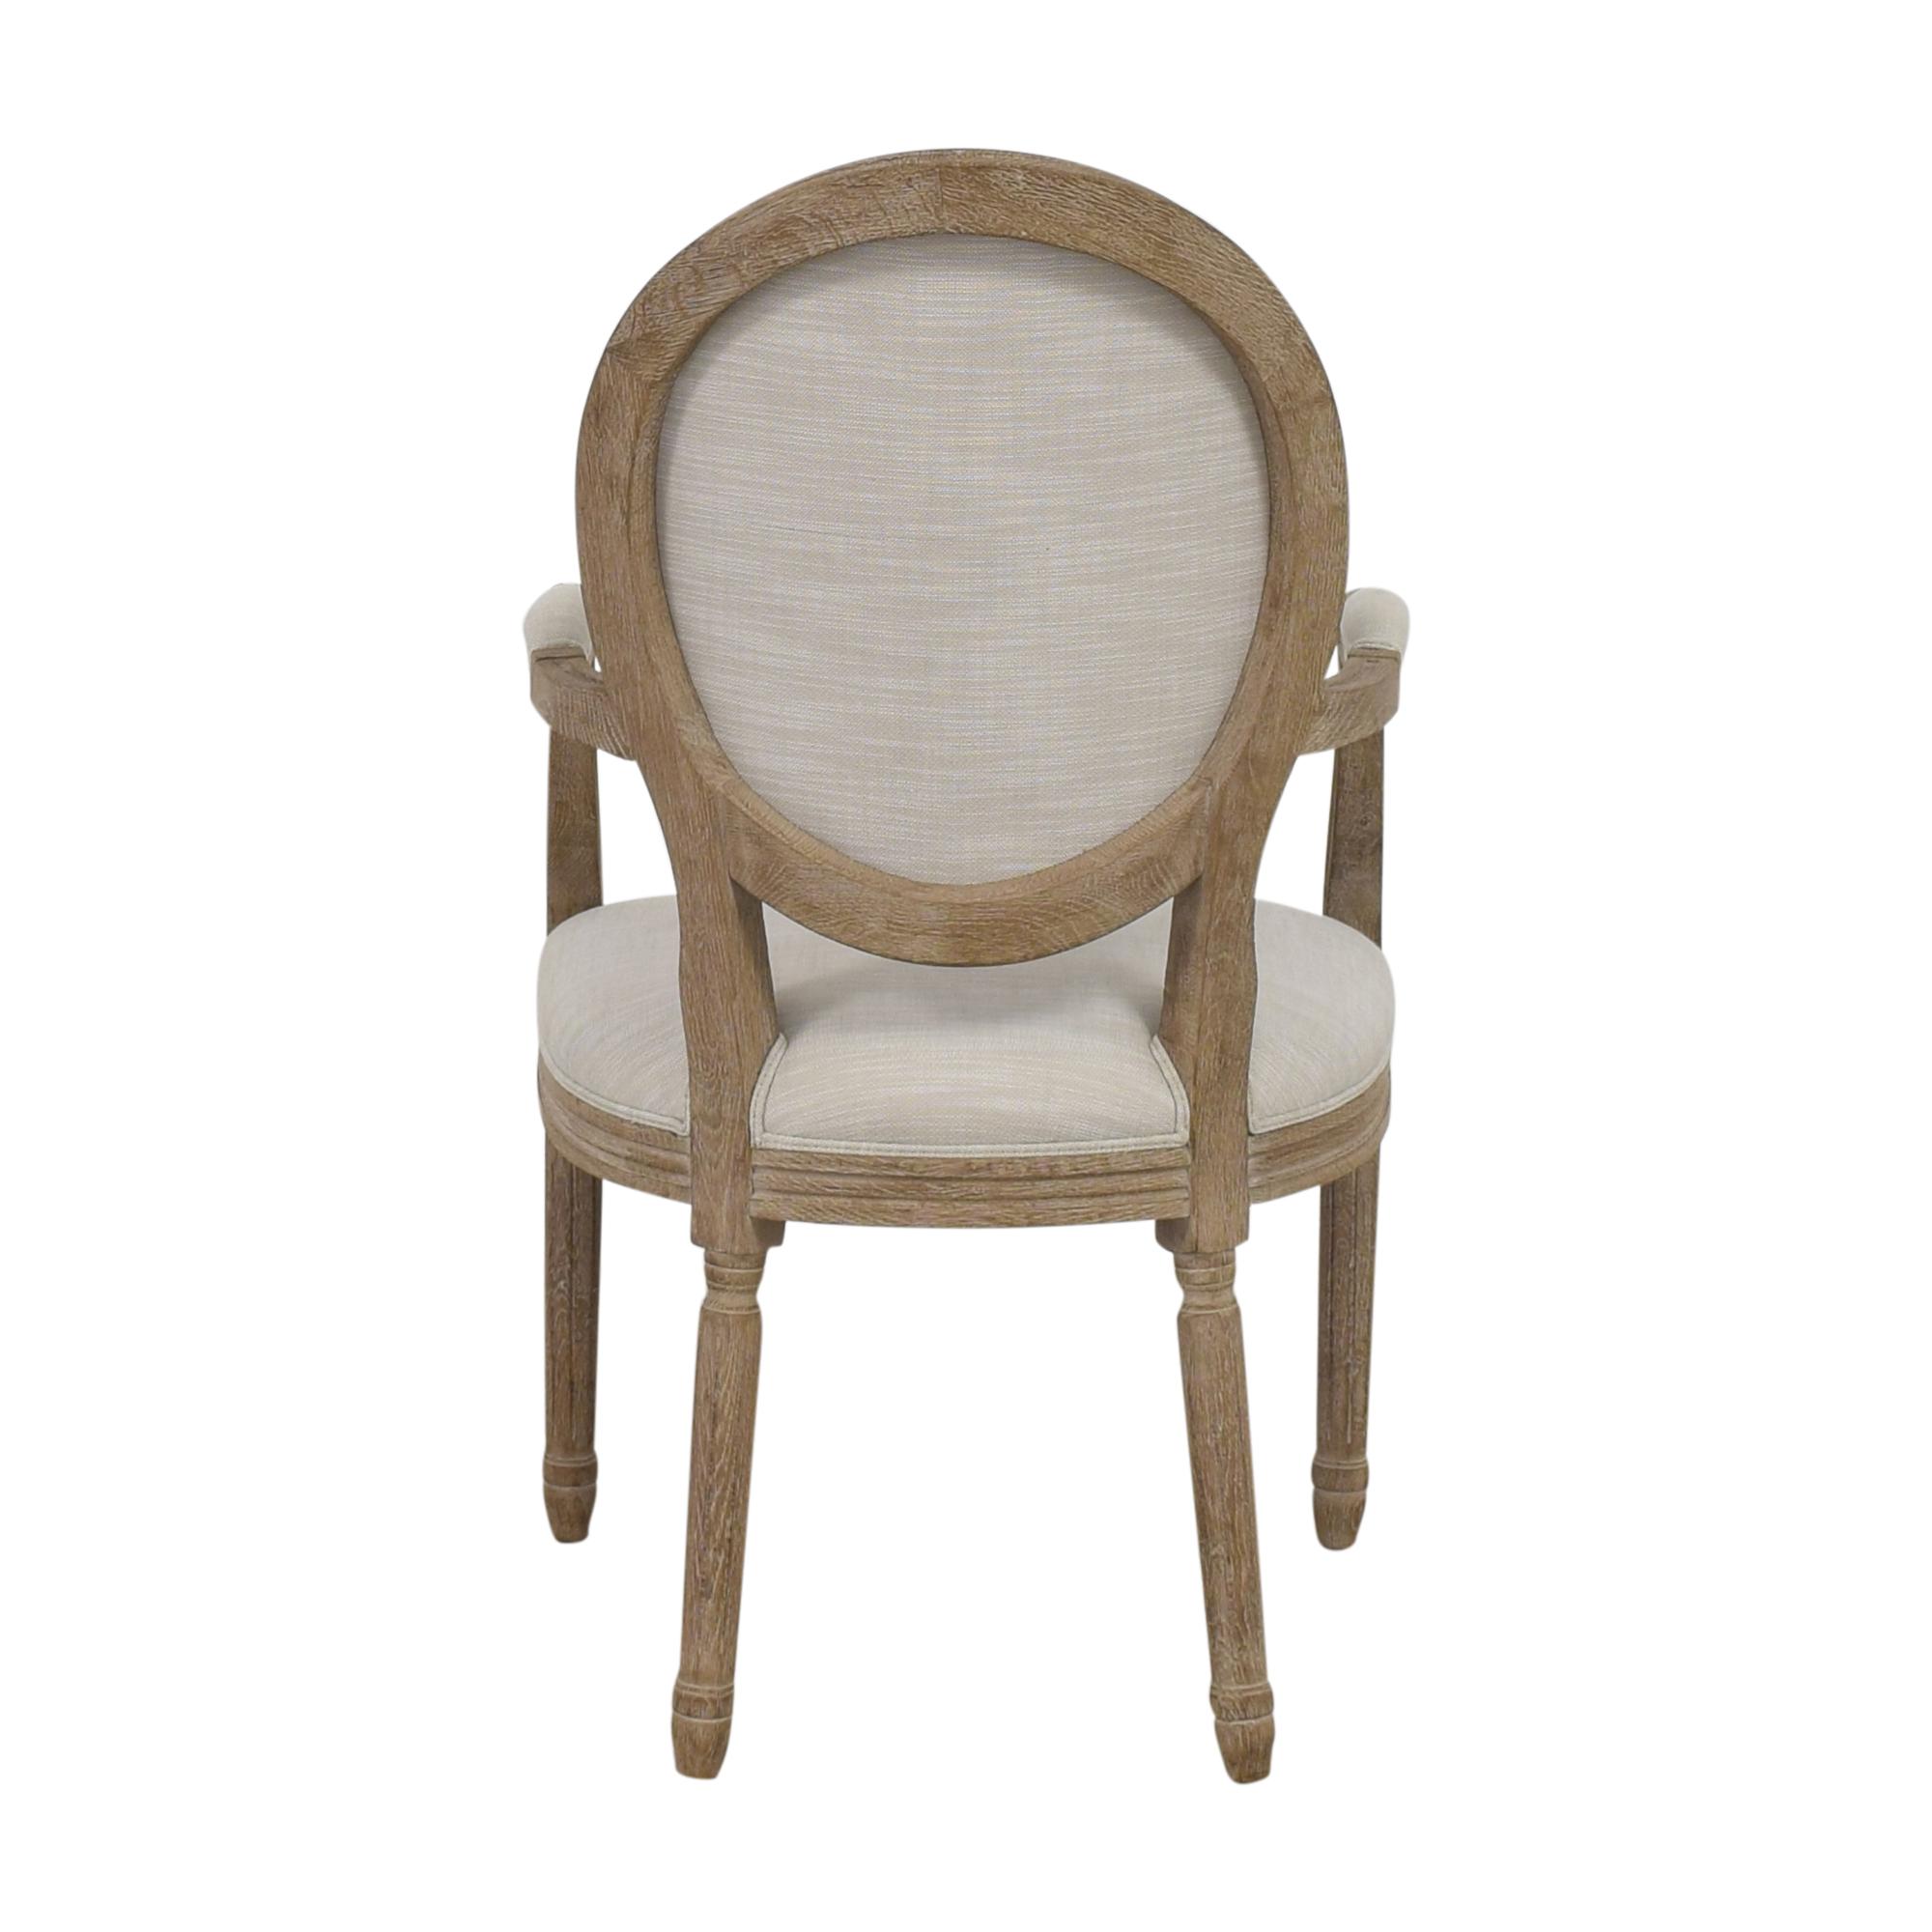 buy Restoration Hardware Vintage French Round Armchair Restoration Hardware Dining Chairs